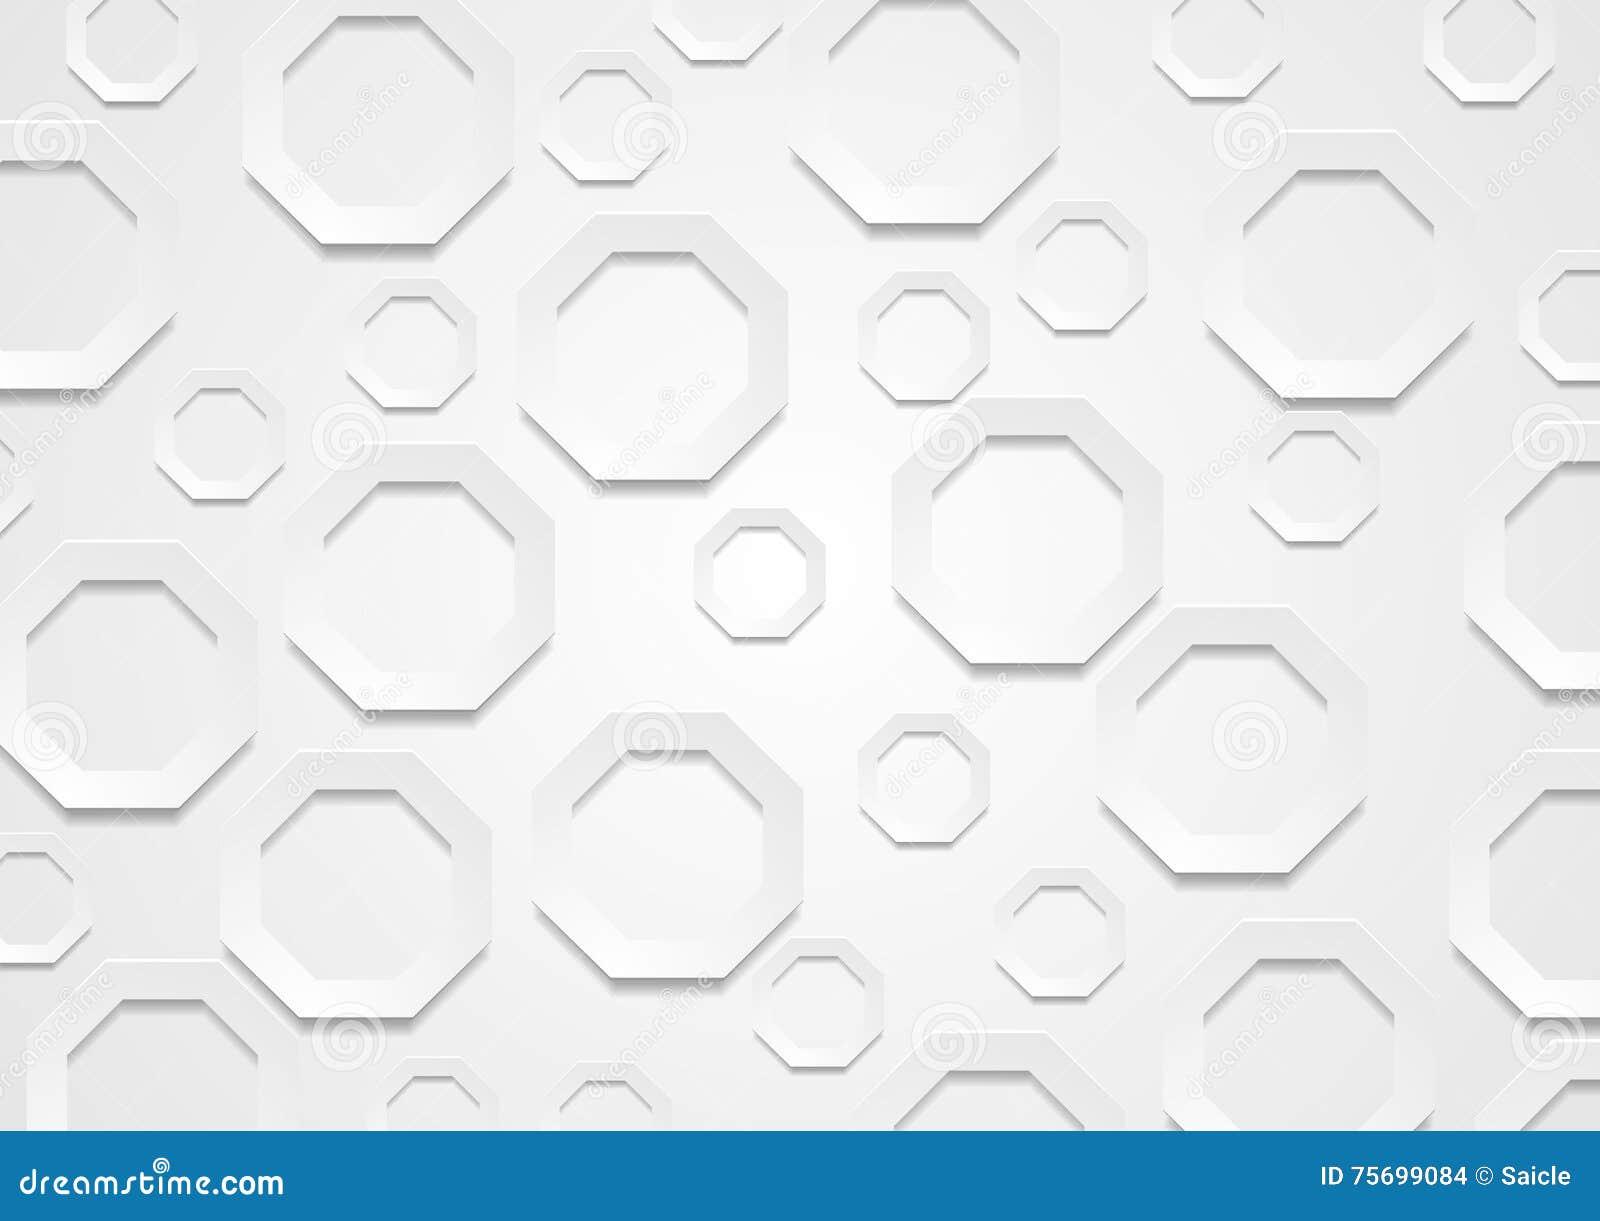 abstract geometric octagon shape - photo #35